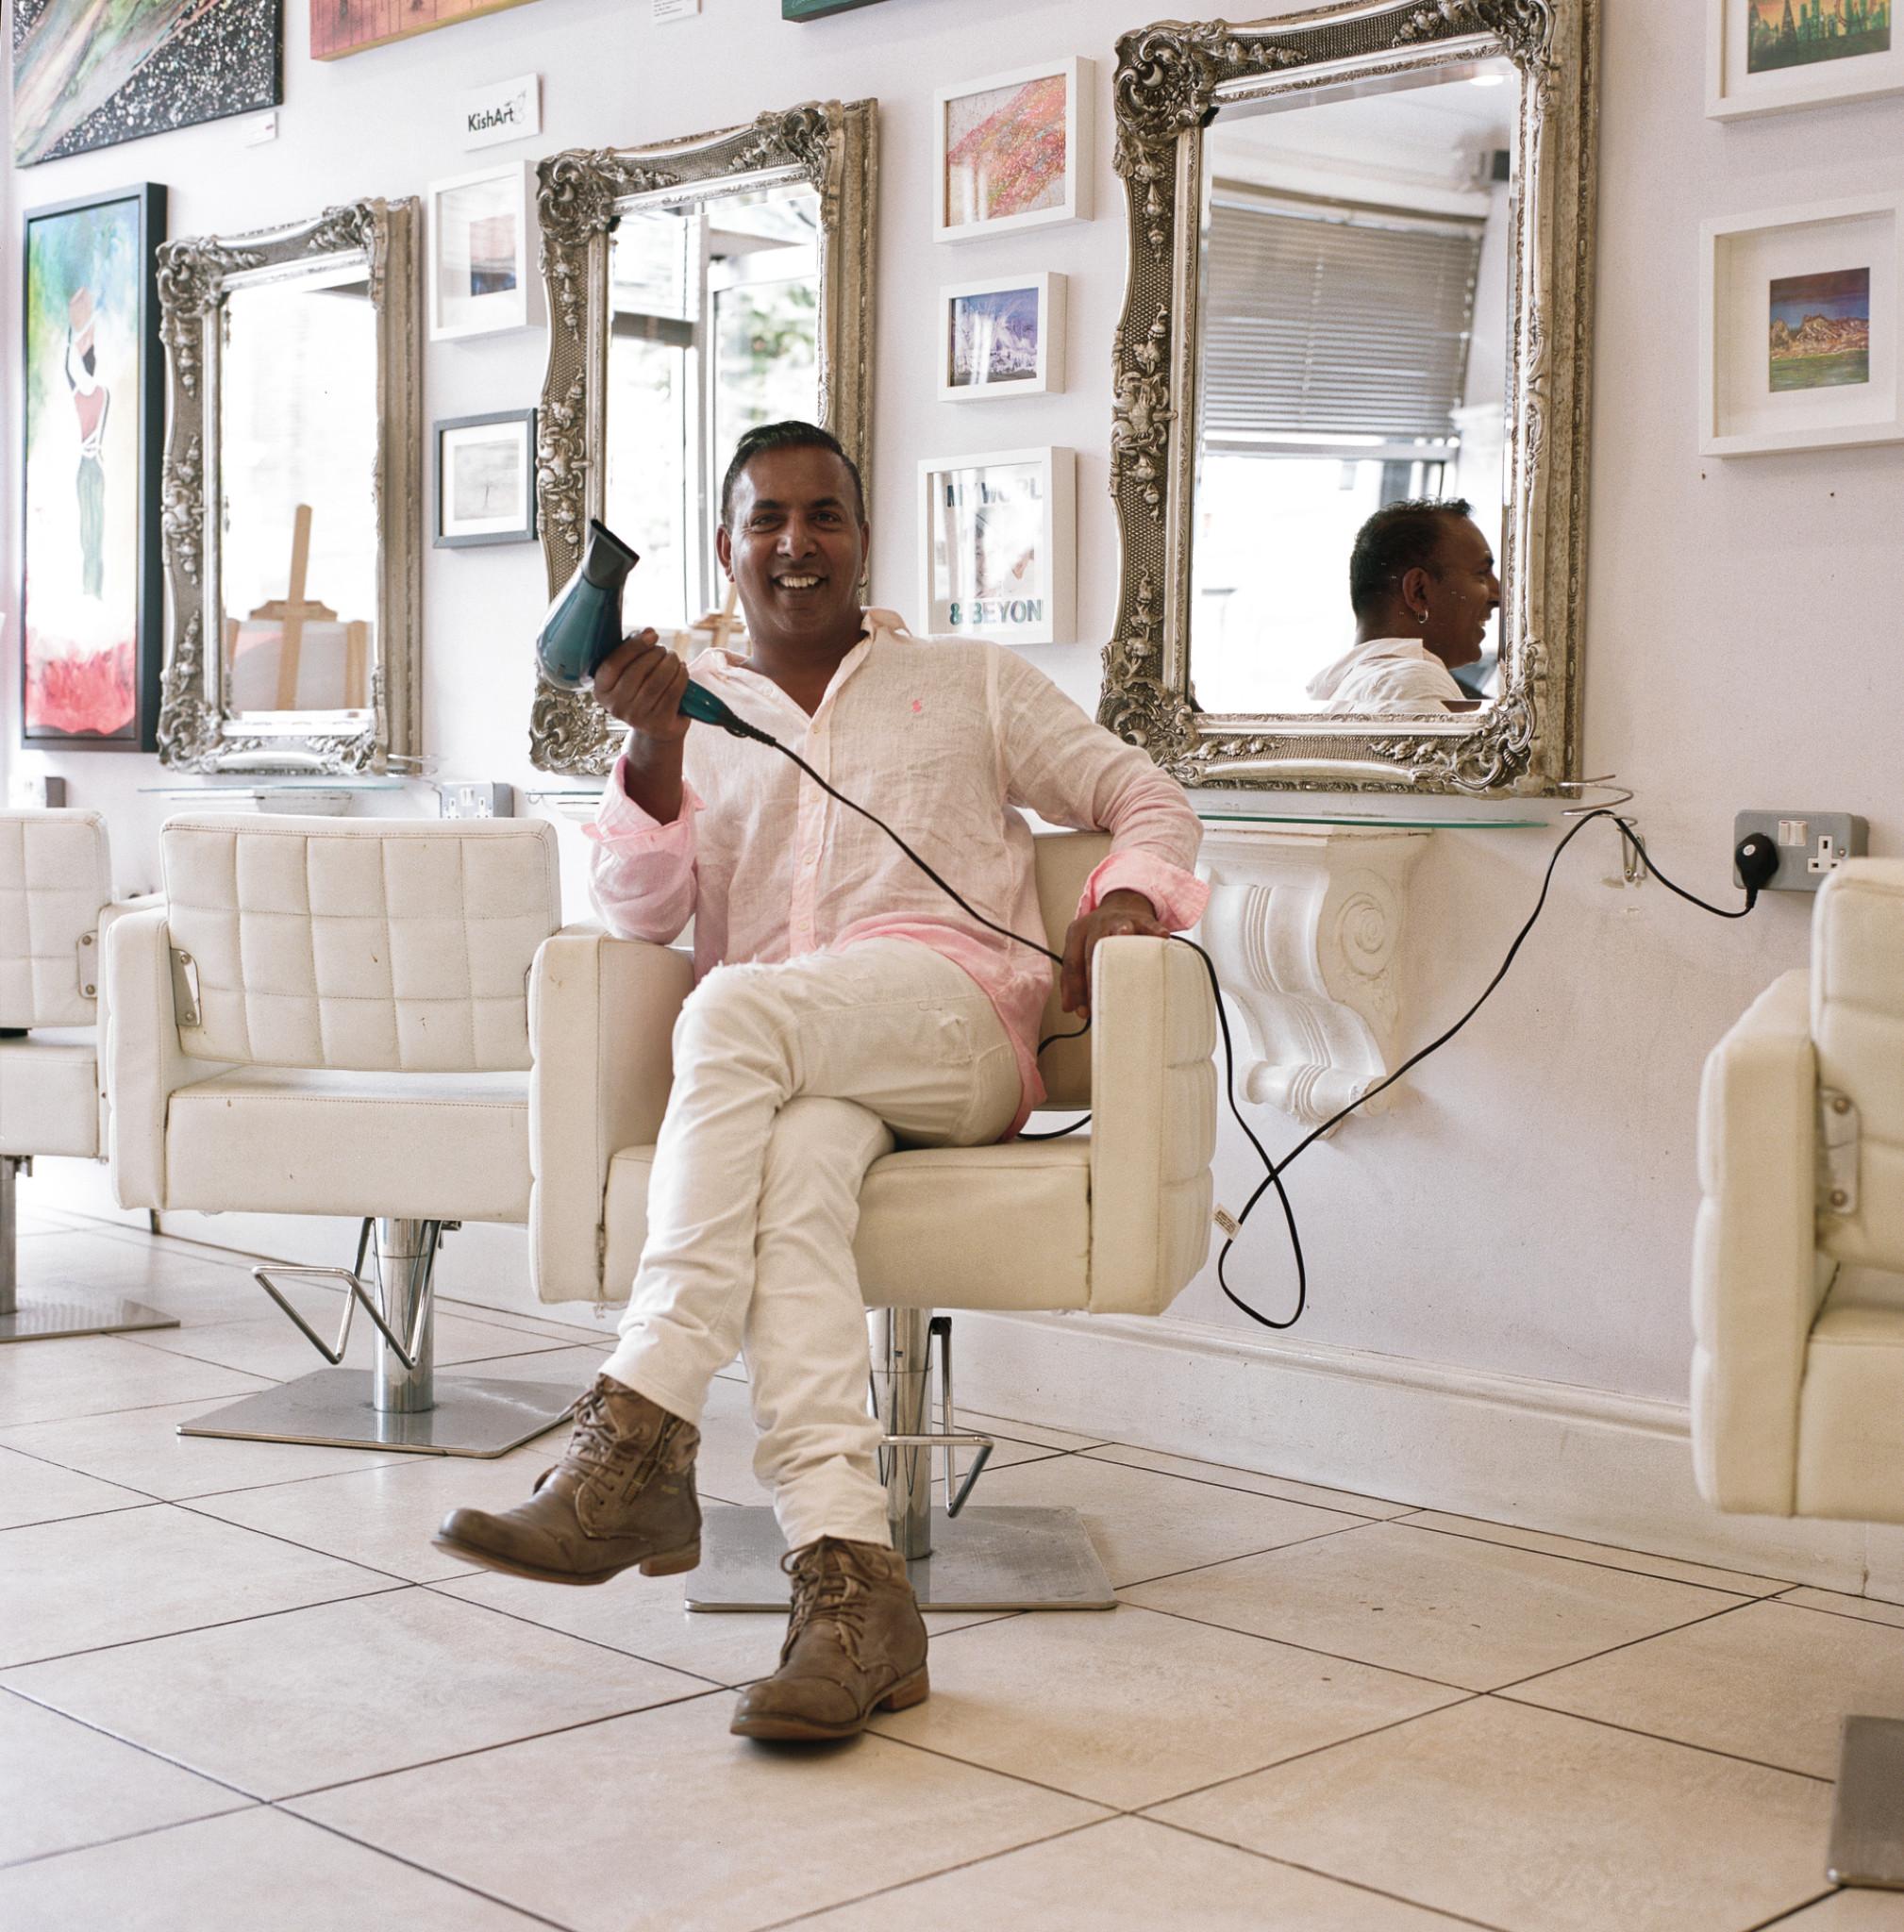 Kish Soobramaney, proprietor of La Zara Art Gallery and Hairdressers  Copyright Graham Land; taken 12th July, 2018